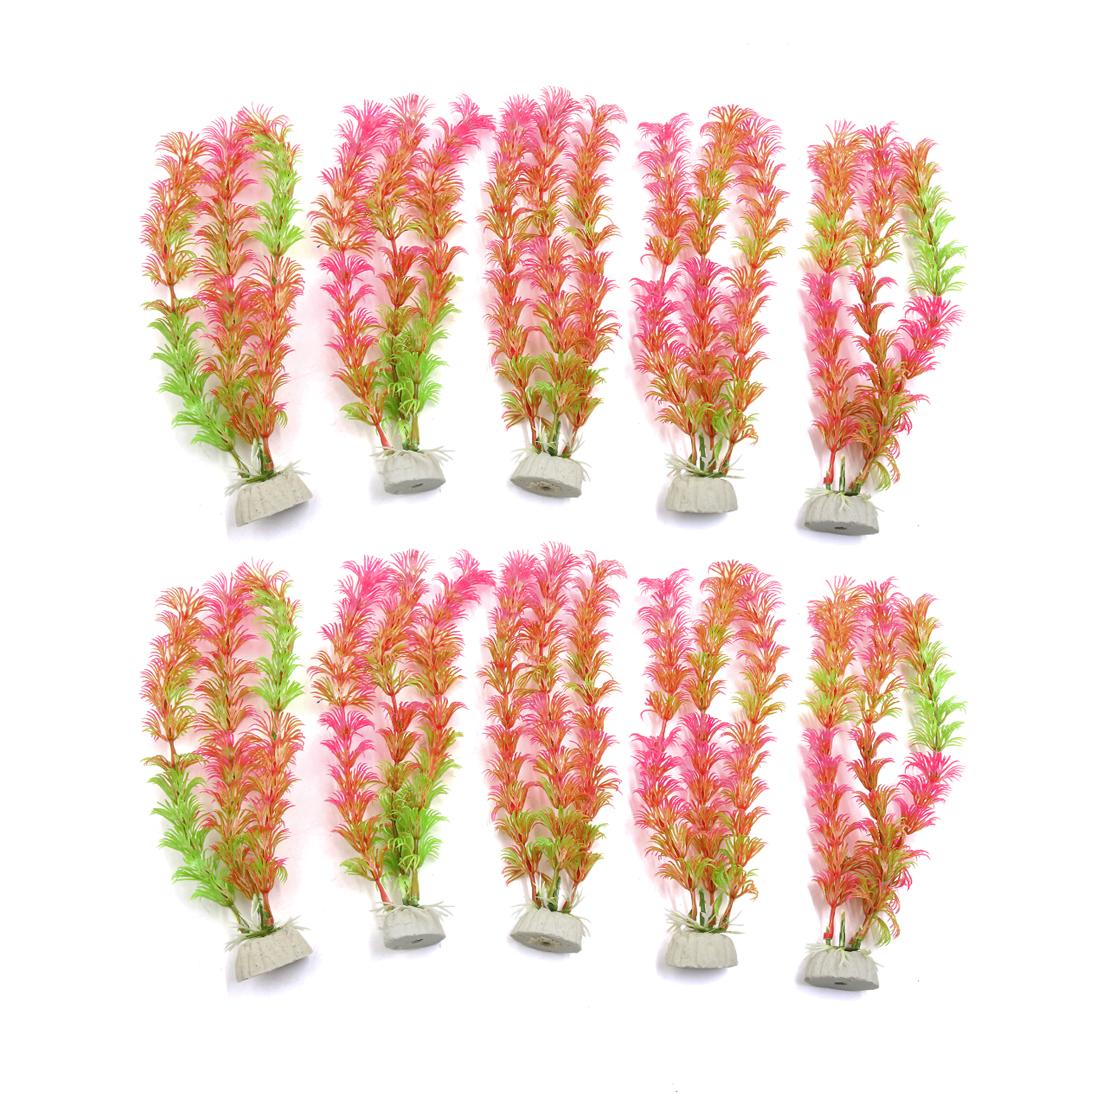 10pcs Pink Plastic Aquarium Plants Fish Tank Water Plant Decoration Ornament